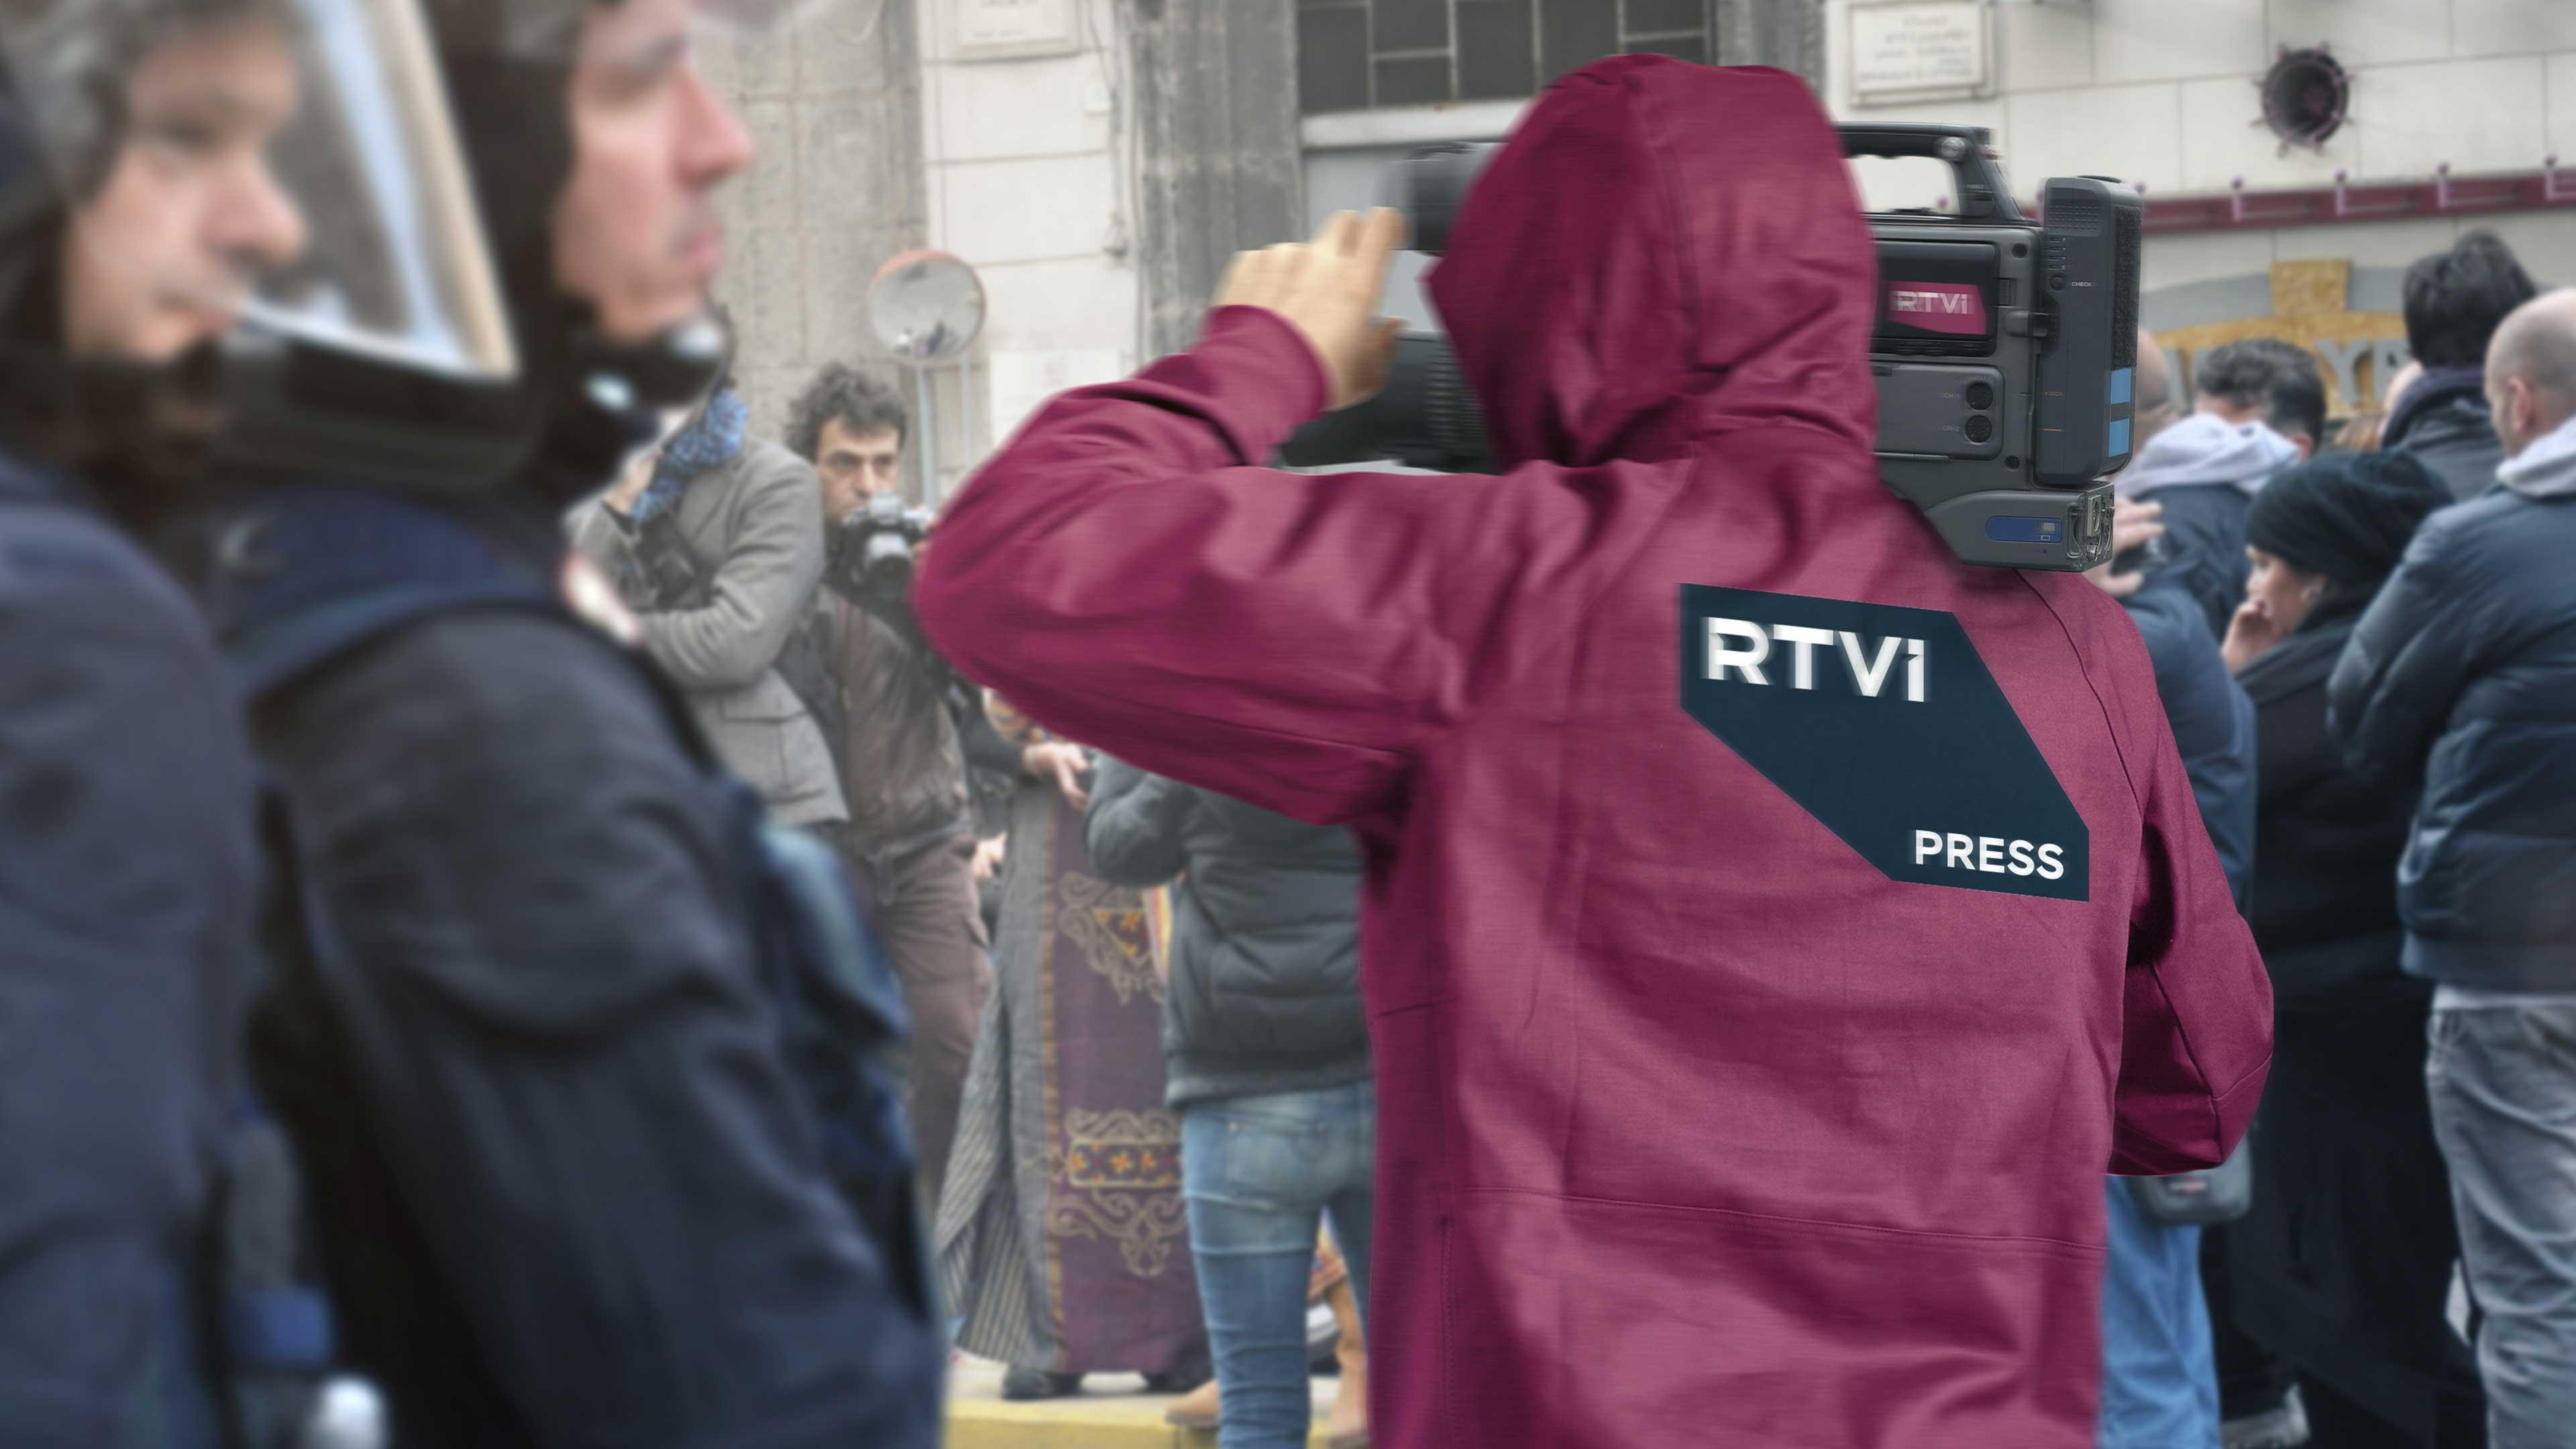 RTVI tv channel